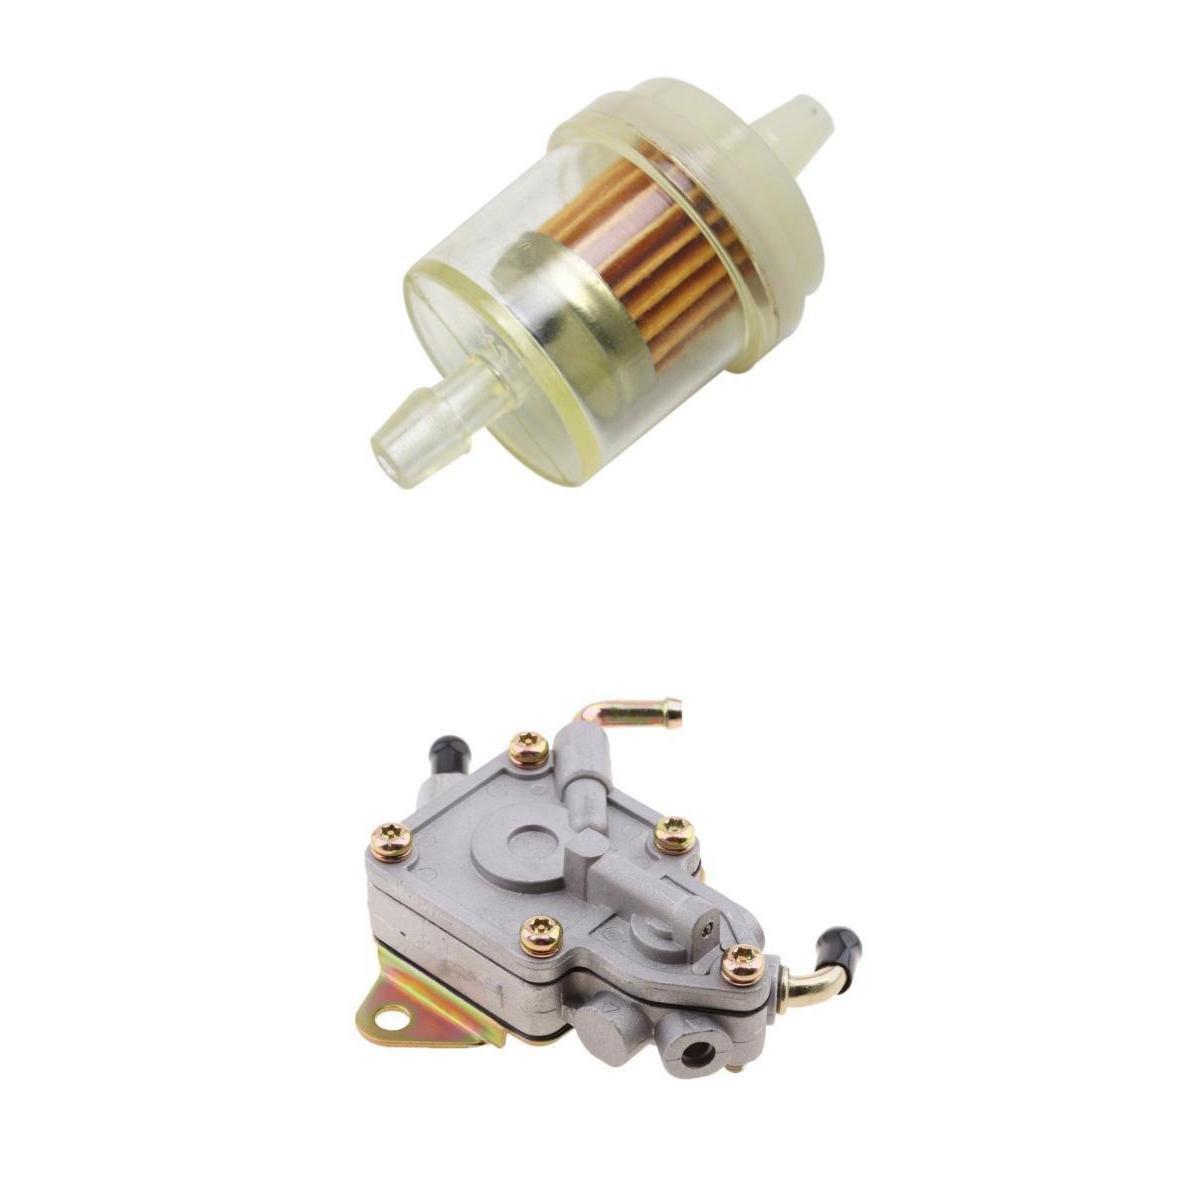 Amazon.com: Baoblaze Fuel Pump + Filter For YAMAHA Rhino 450 660 UTV  5UG-13910-01-0 5UG13910010 2007-2009: Automotive